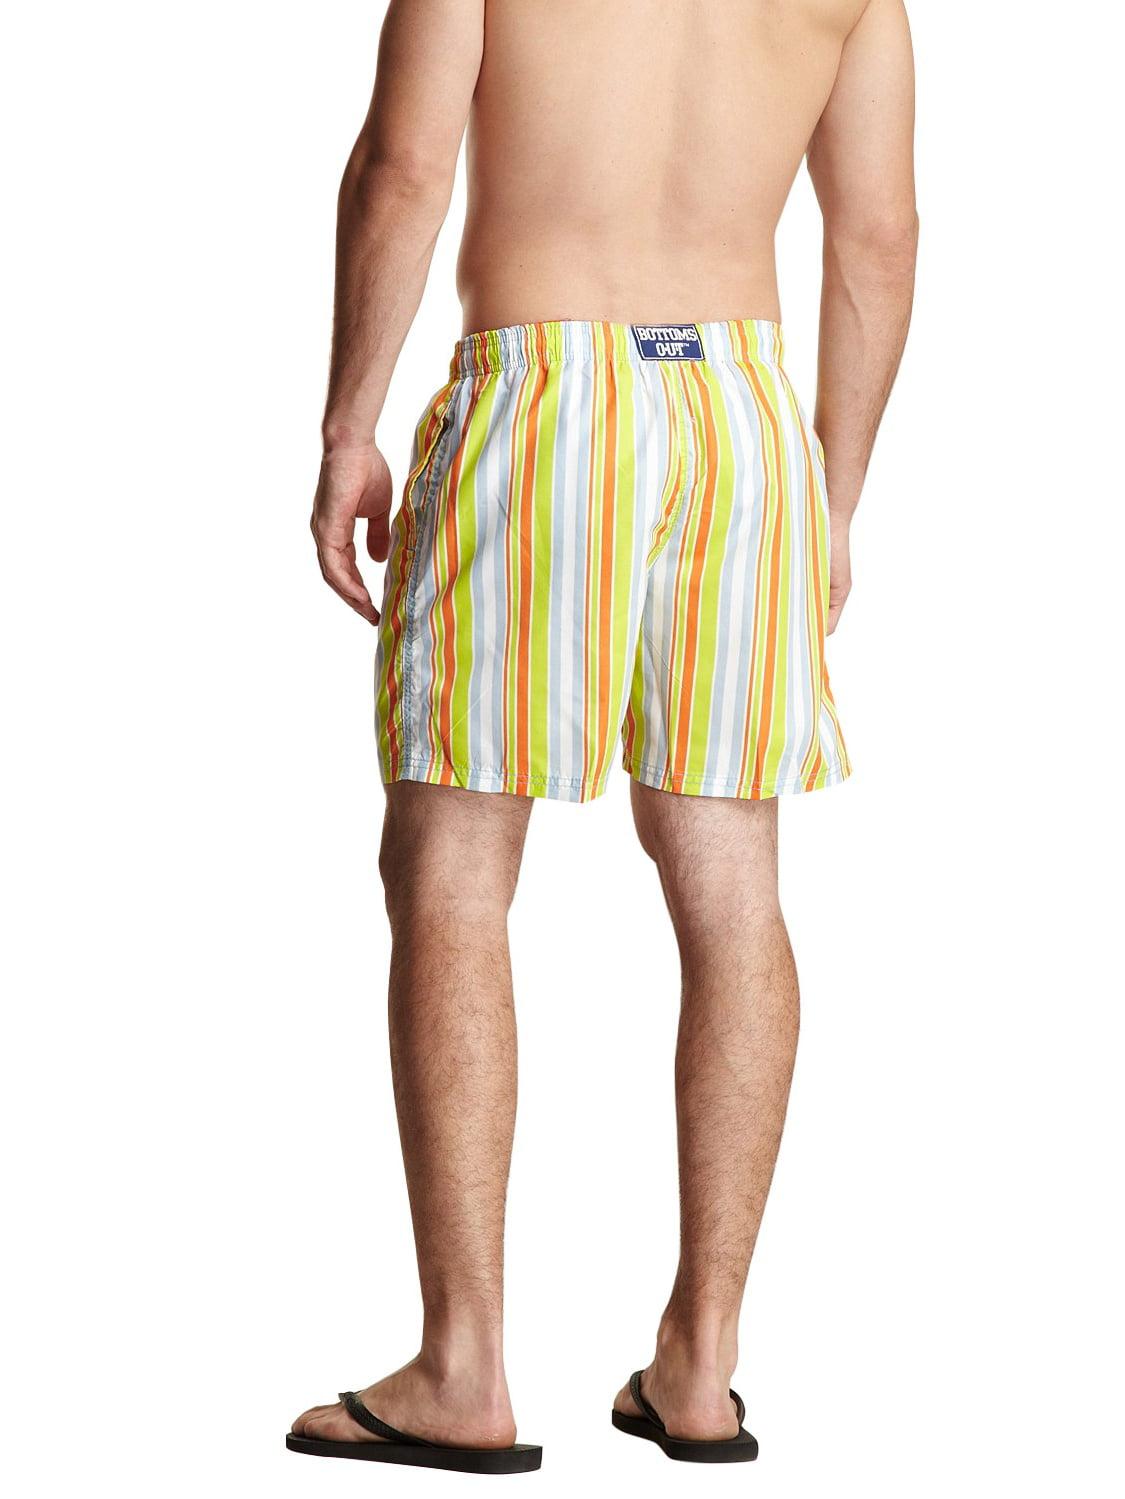 Mens Cute Dog Paw Print Style Beach Shorts Casual Drawstring Adjustable Swim Short